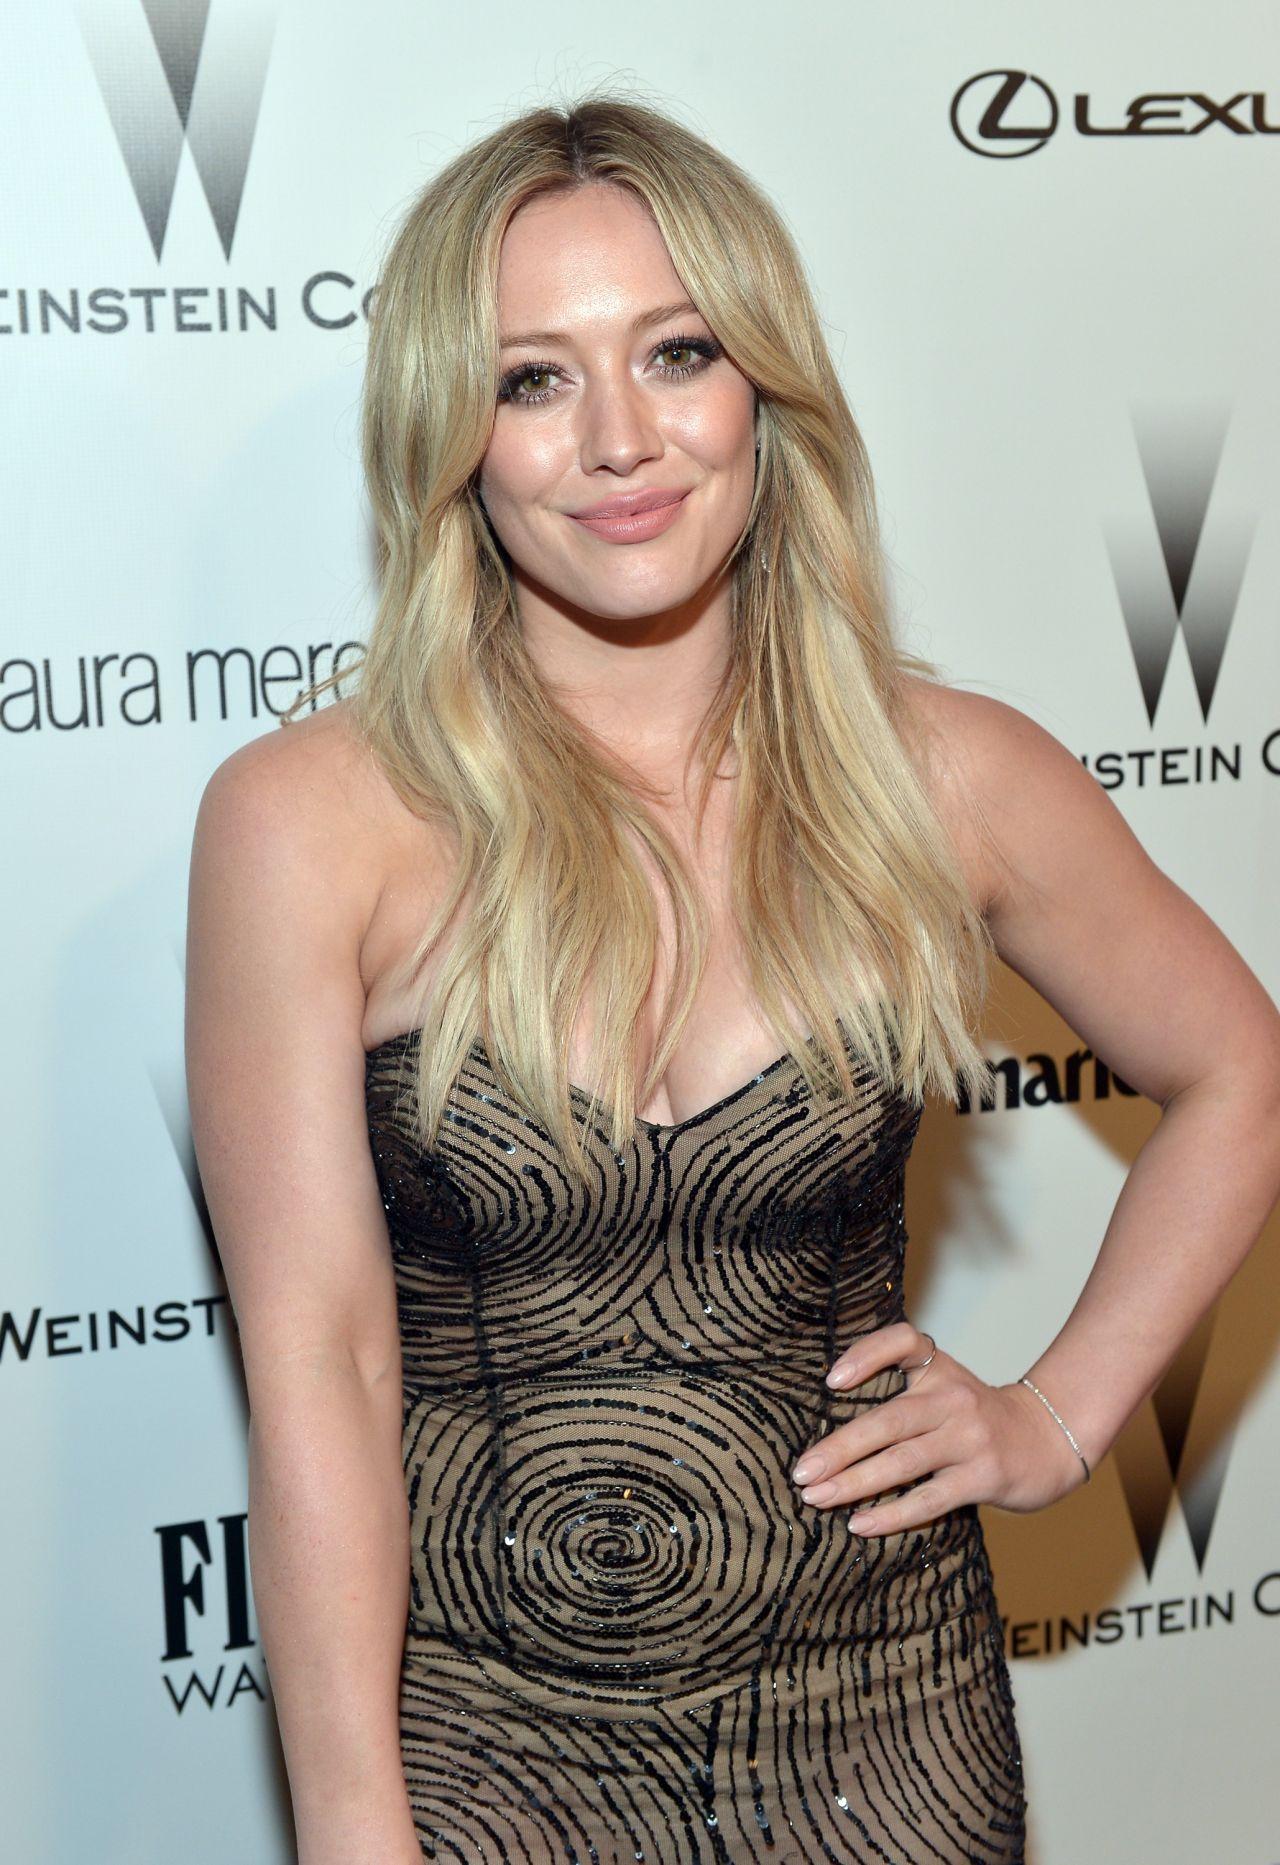 Hilary Duff Hot Bikini Photoshoots, Hd Images Gallery